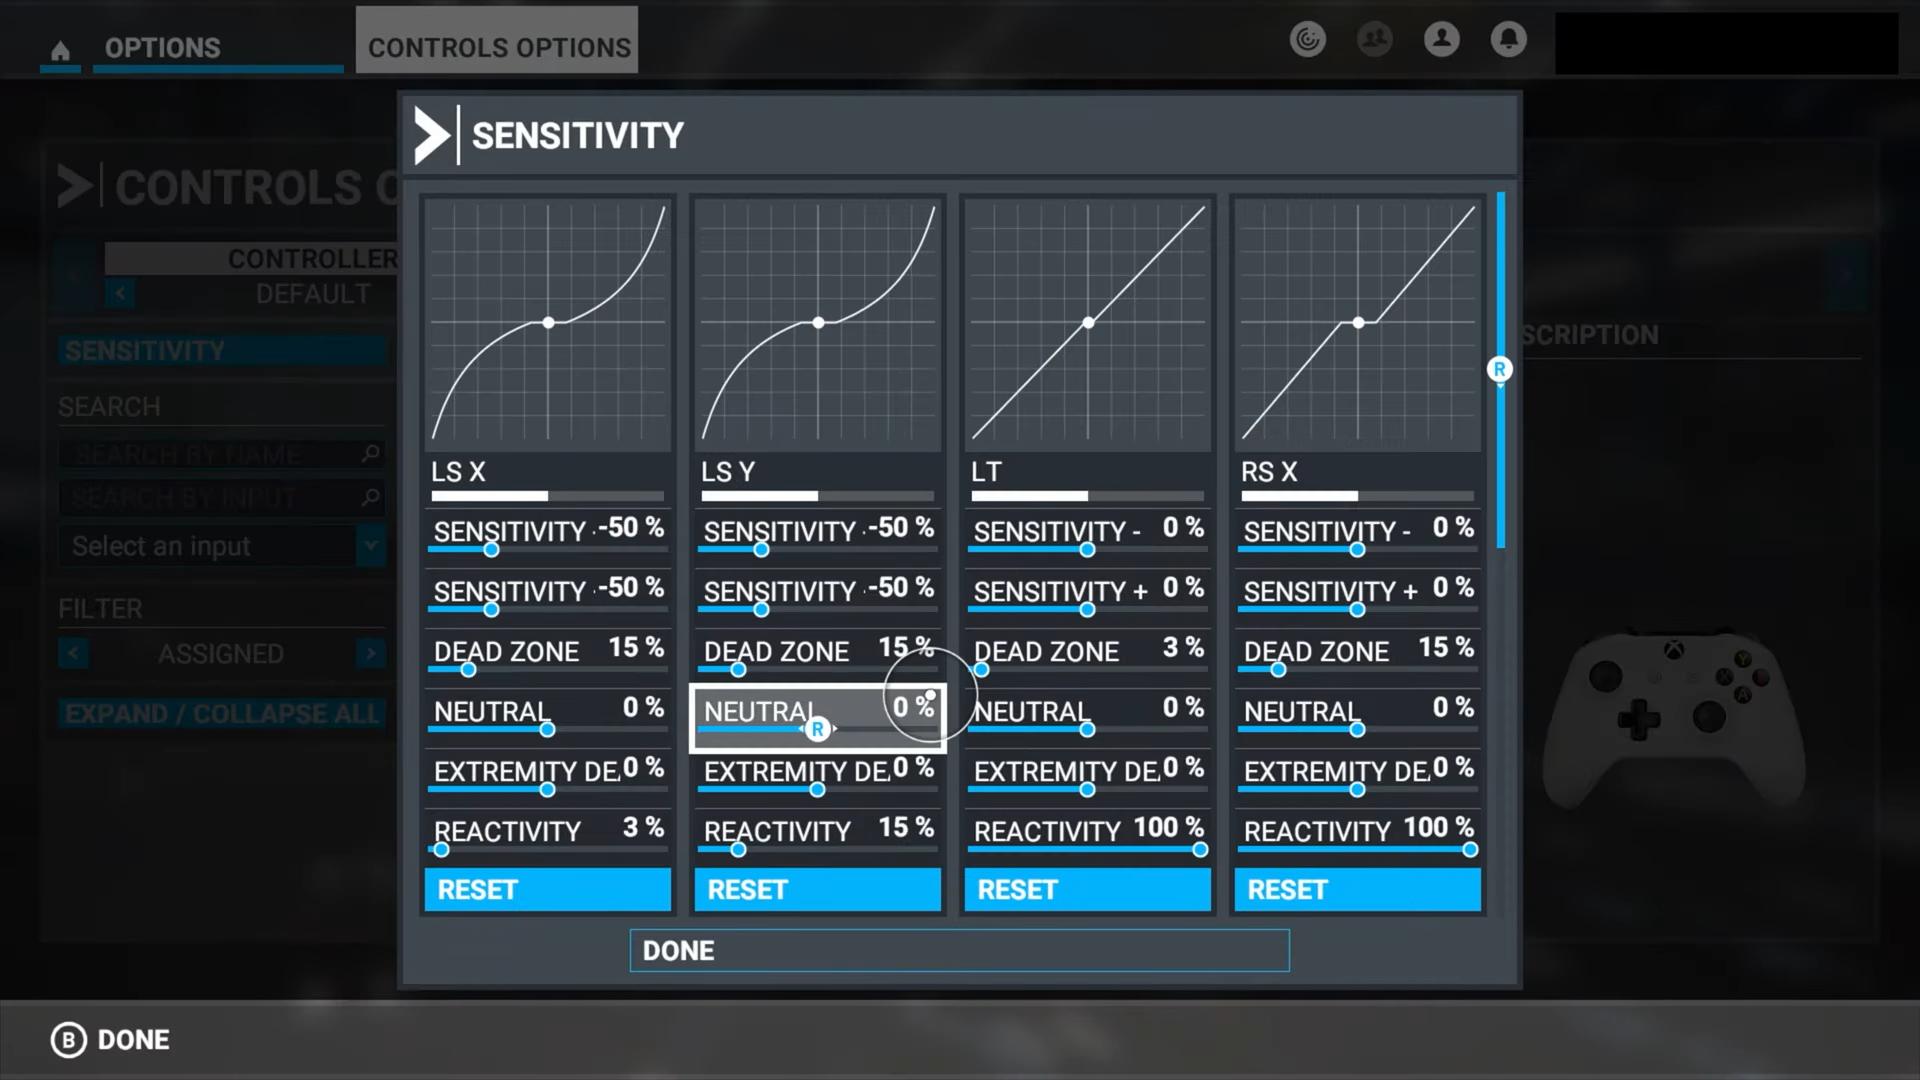 A screenshot of the Sensitivity options.